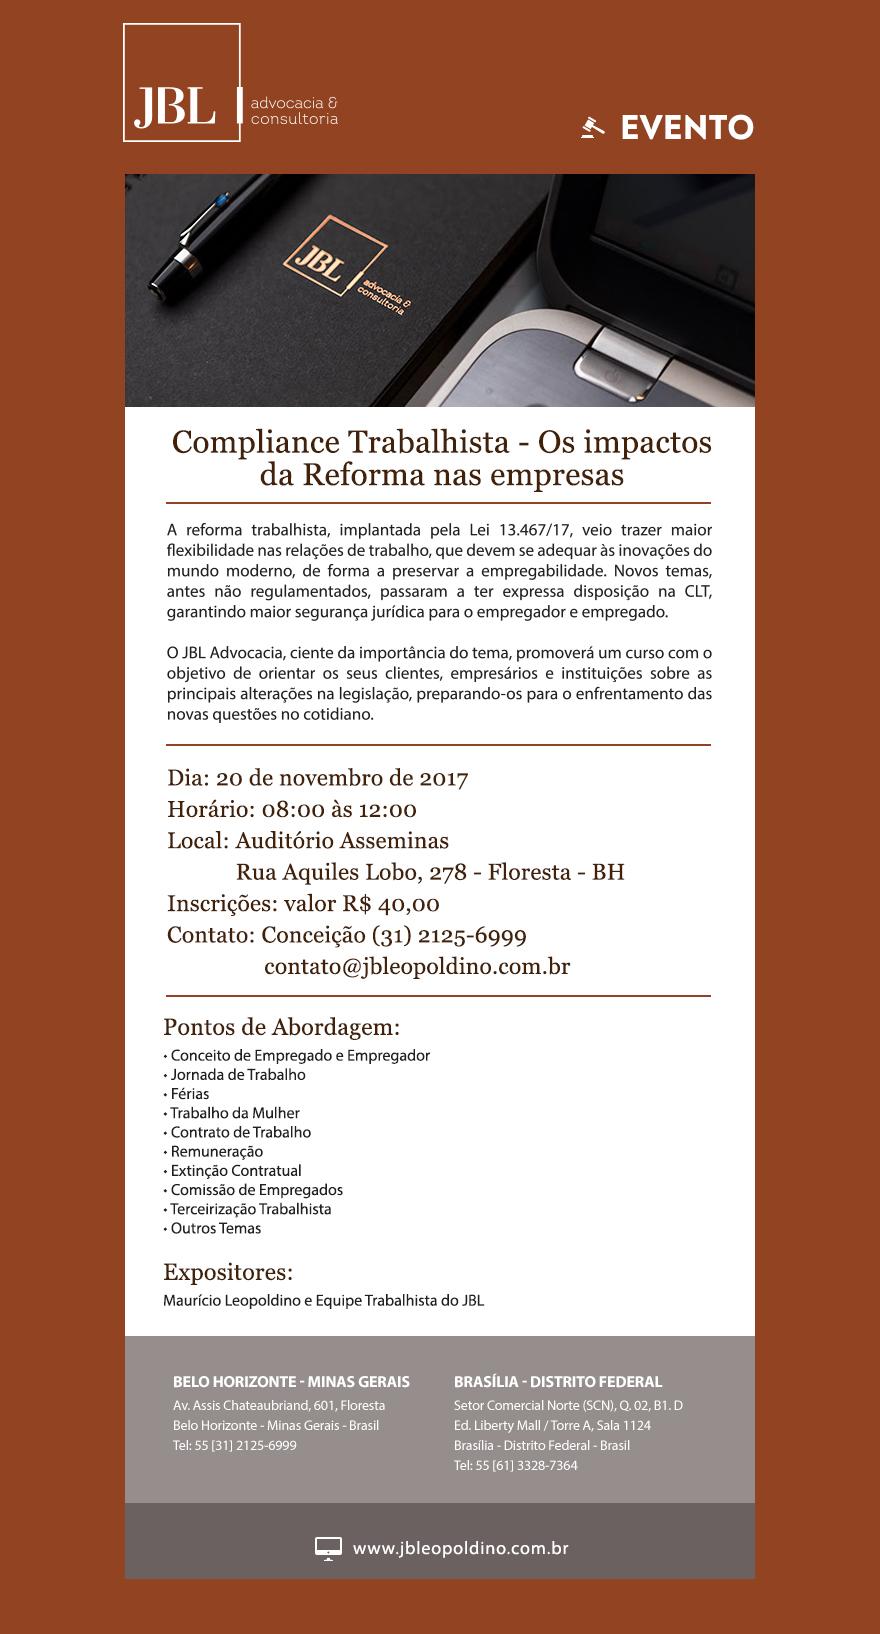 JBL_evento-Compliance-Trabalhista